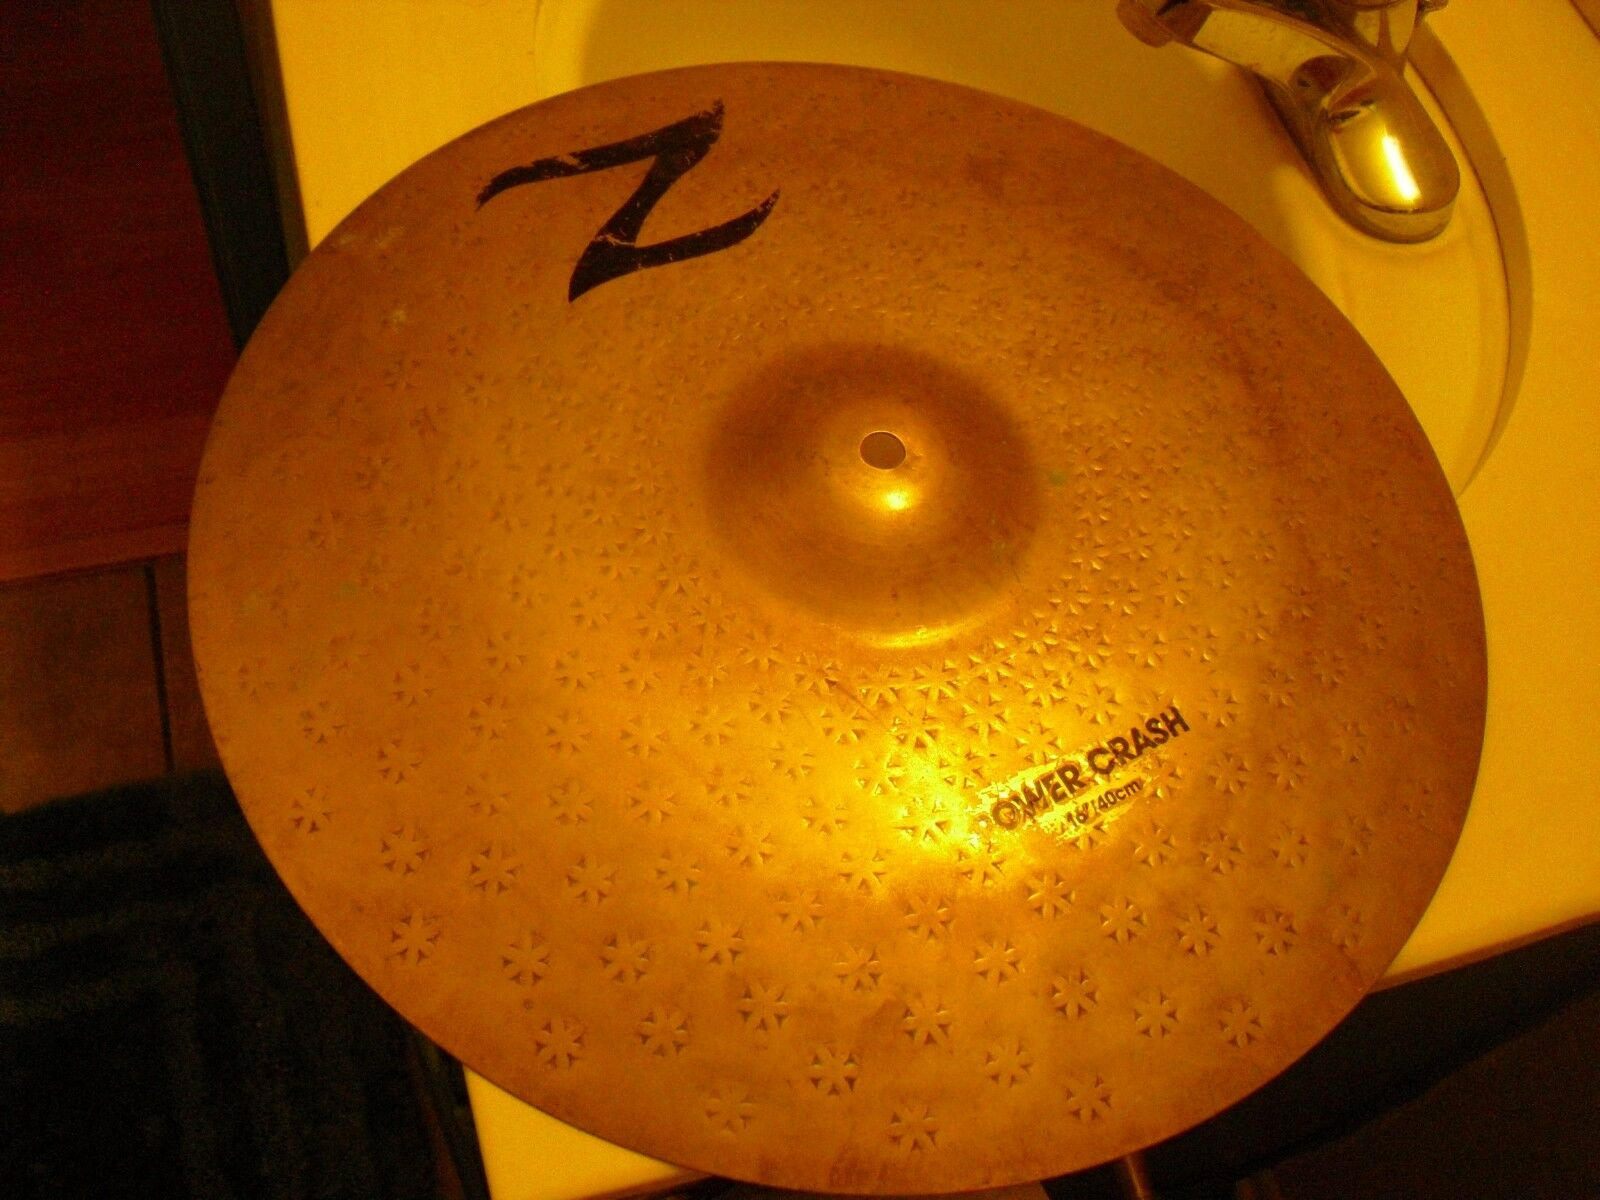 16  Zildjian Z Series Power Crash Cymbal raw finish 1250g